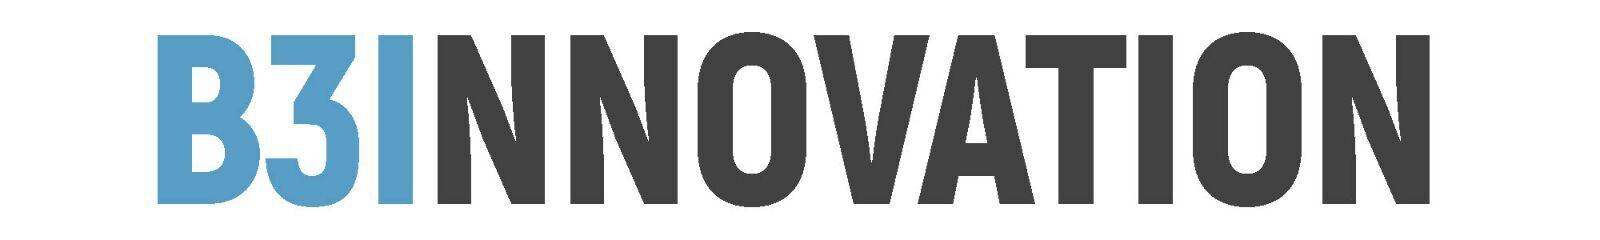 logo-b3innovation